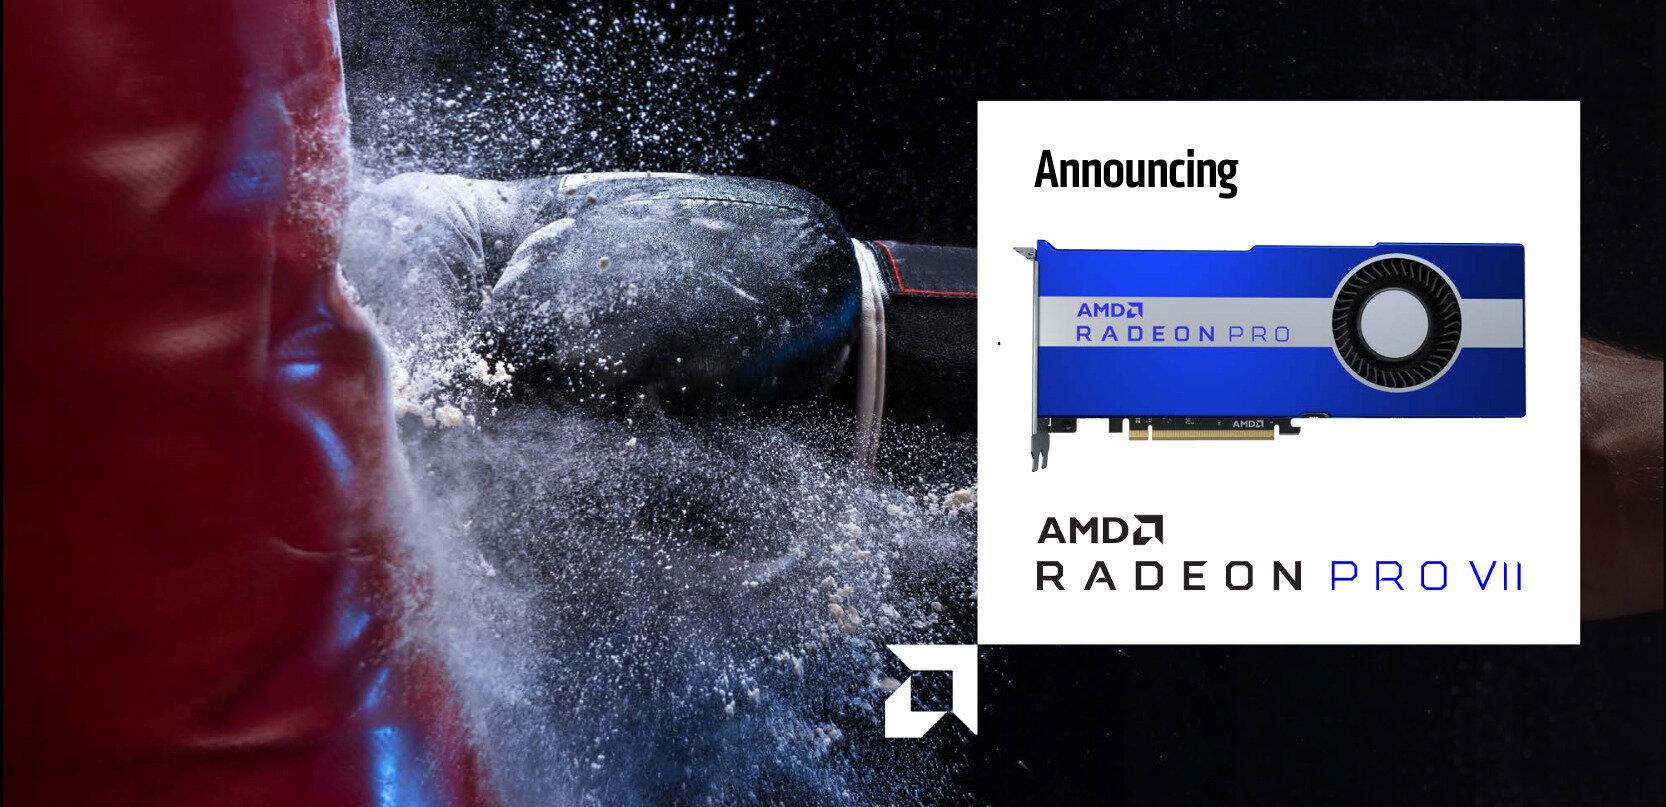 AMD annonce sa Radeon Pro VII (Vega 20, PCIe 4.0), ses pilotes 20.Q2 et ProRender 2.0